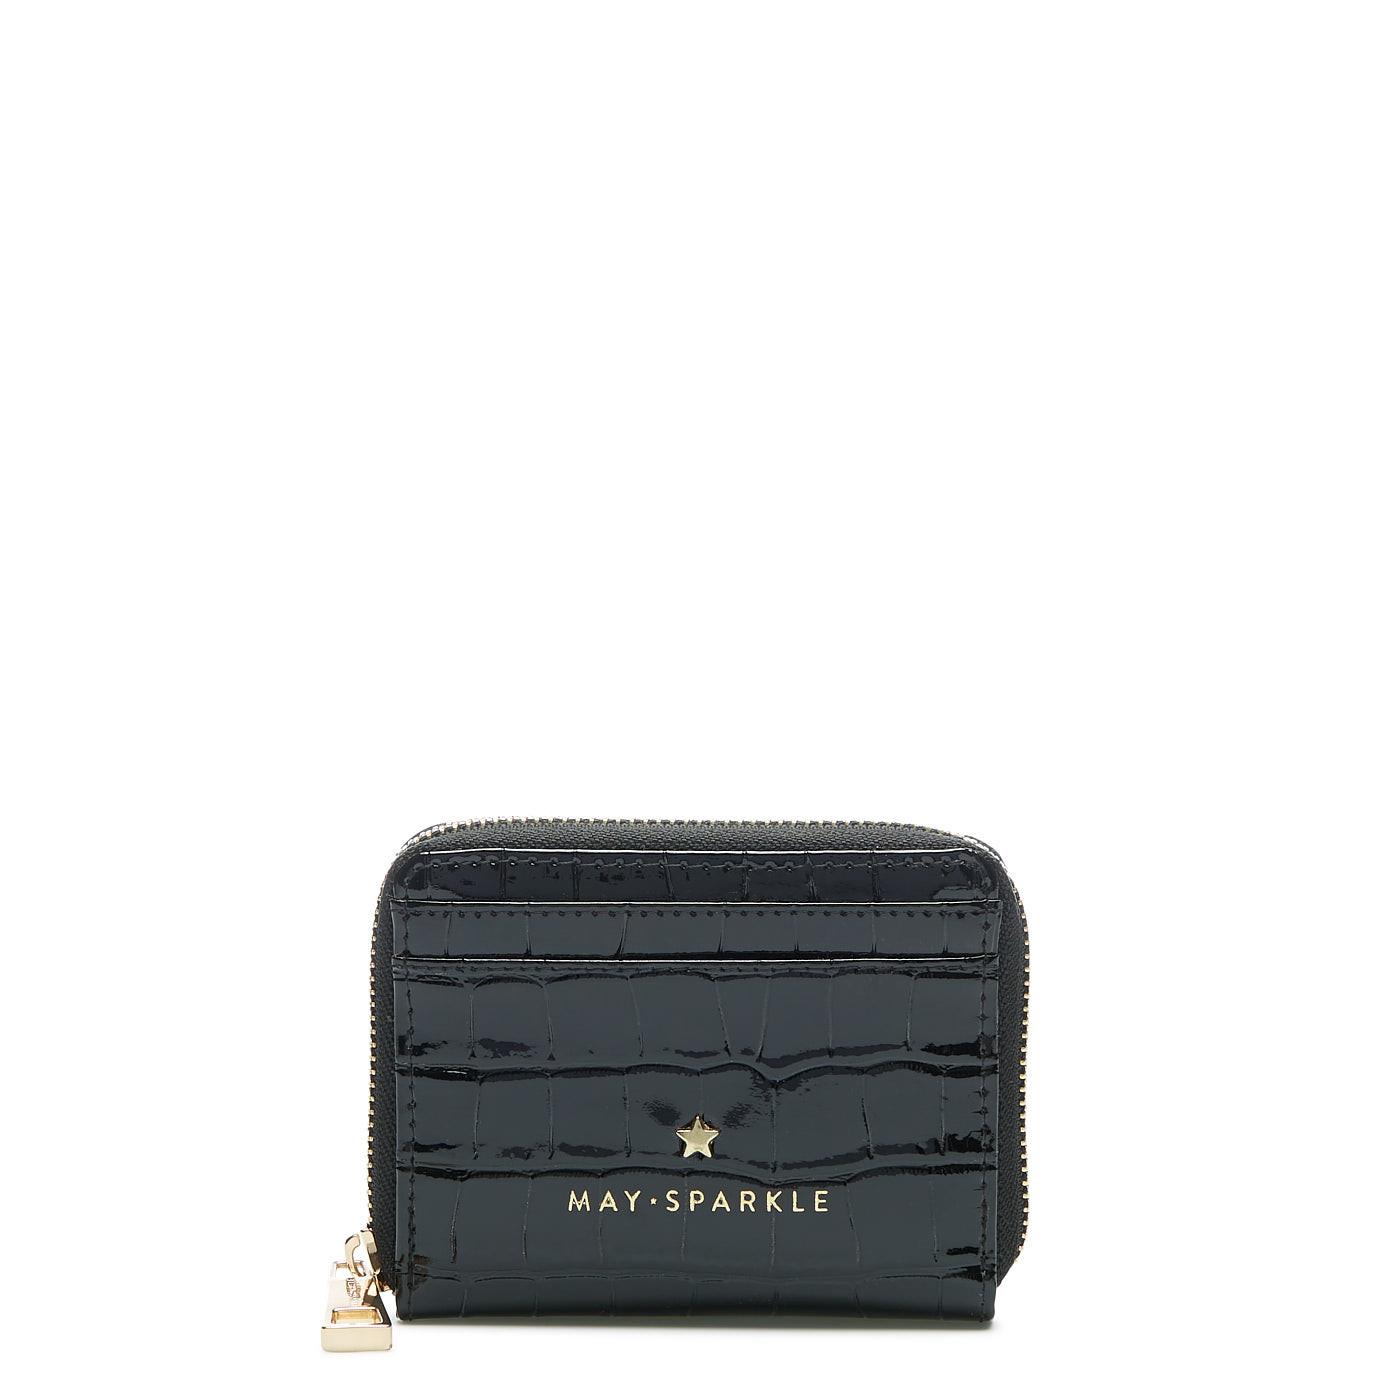 May Sparkle Festive black croco Zipper wallet